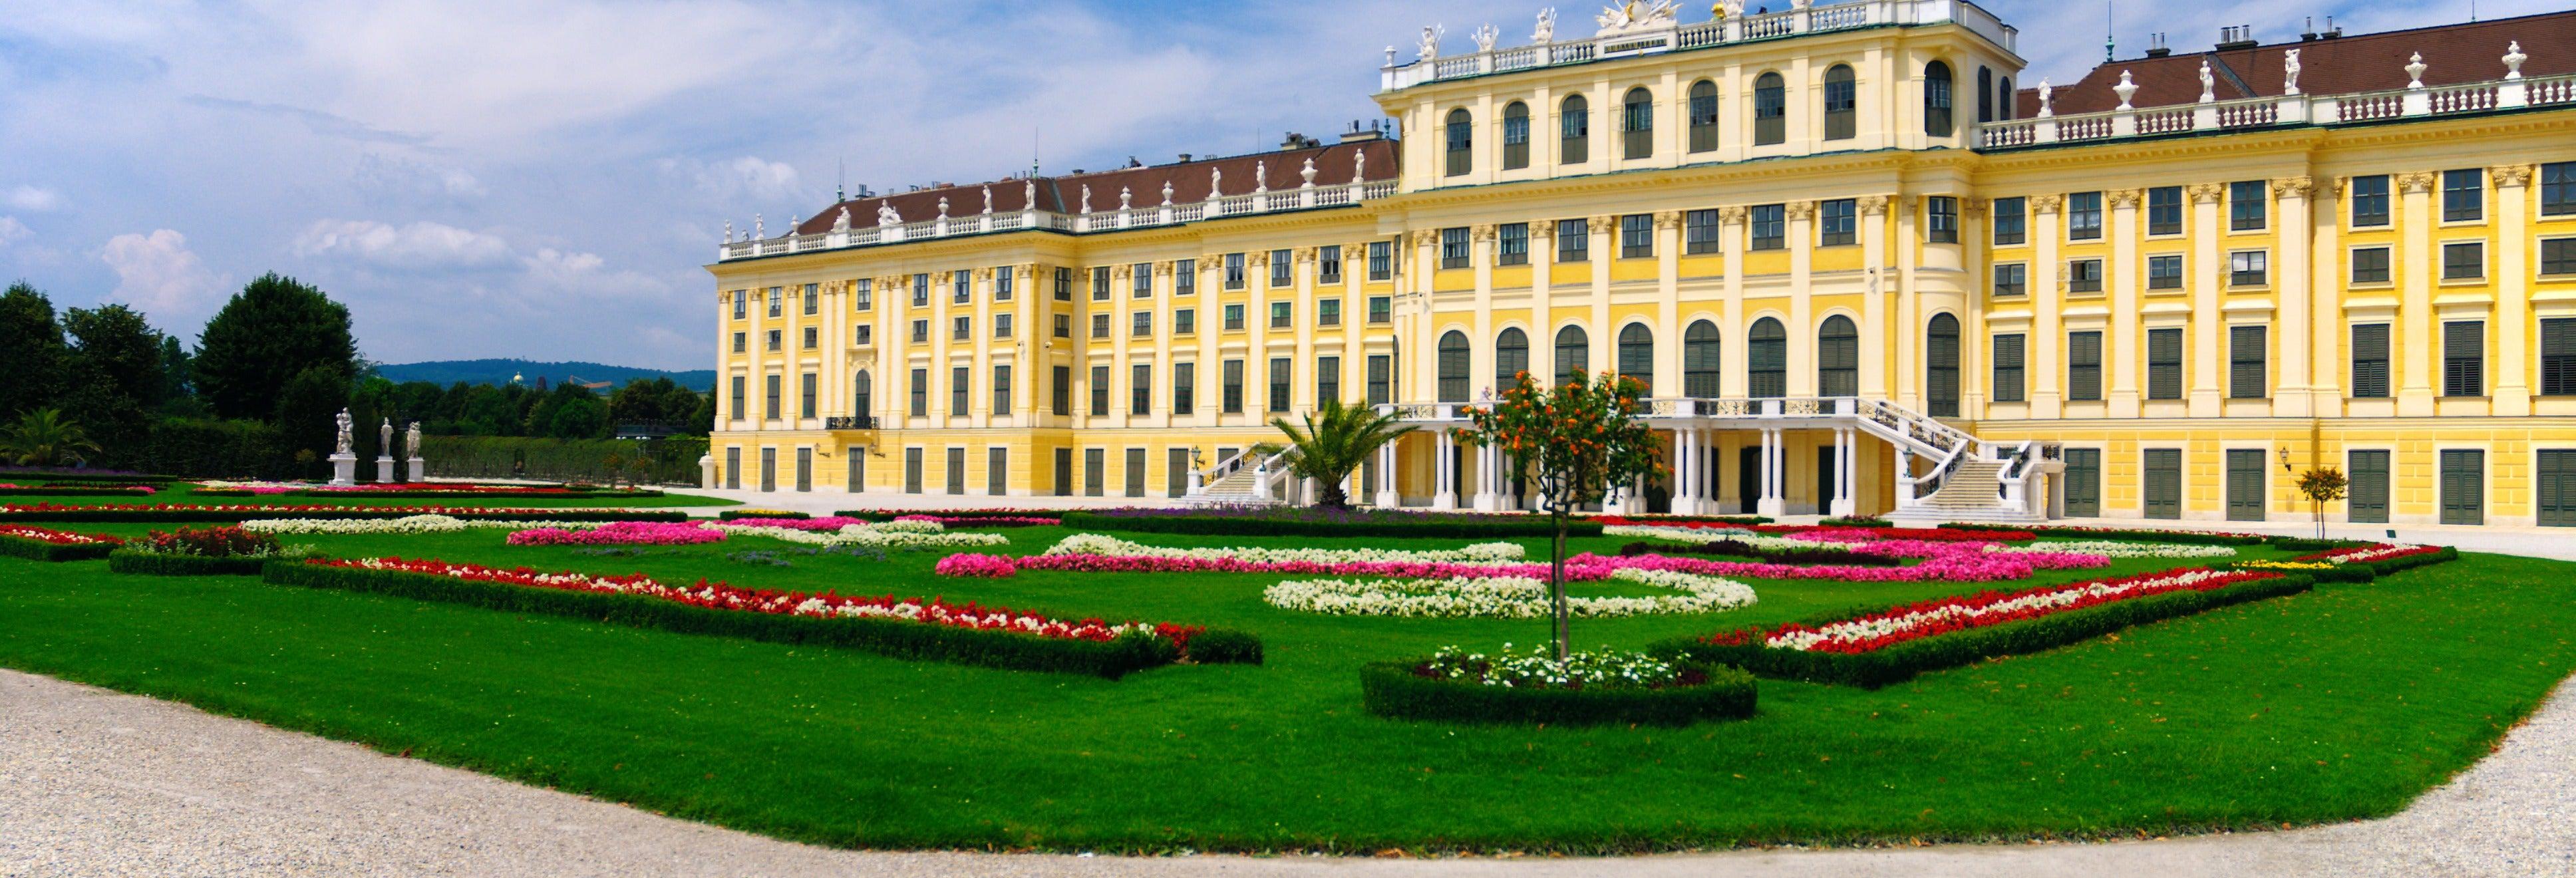 Tour of Vienna and the Schönbrunn Palace